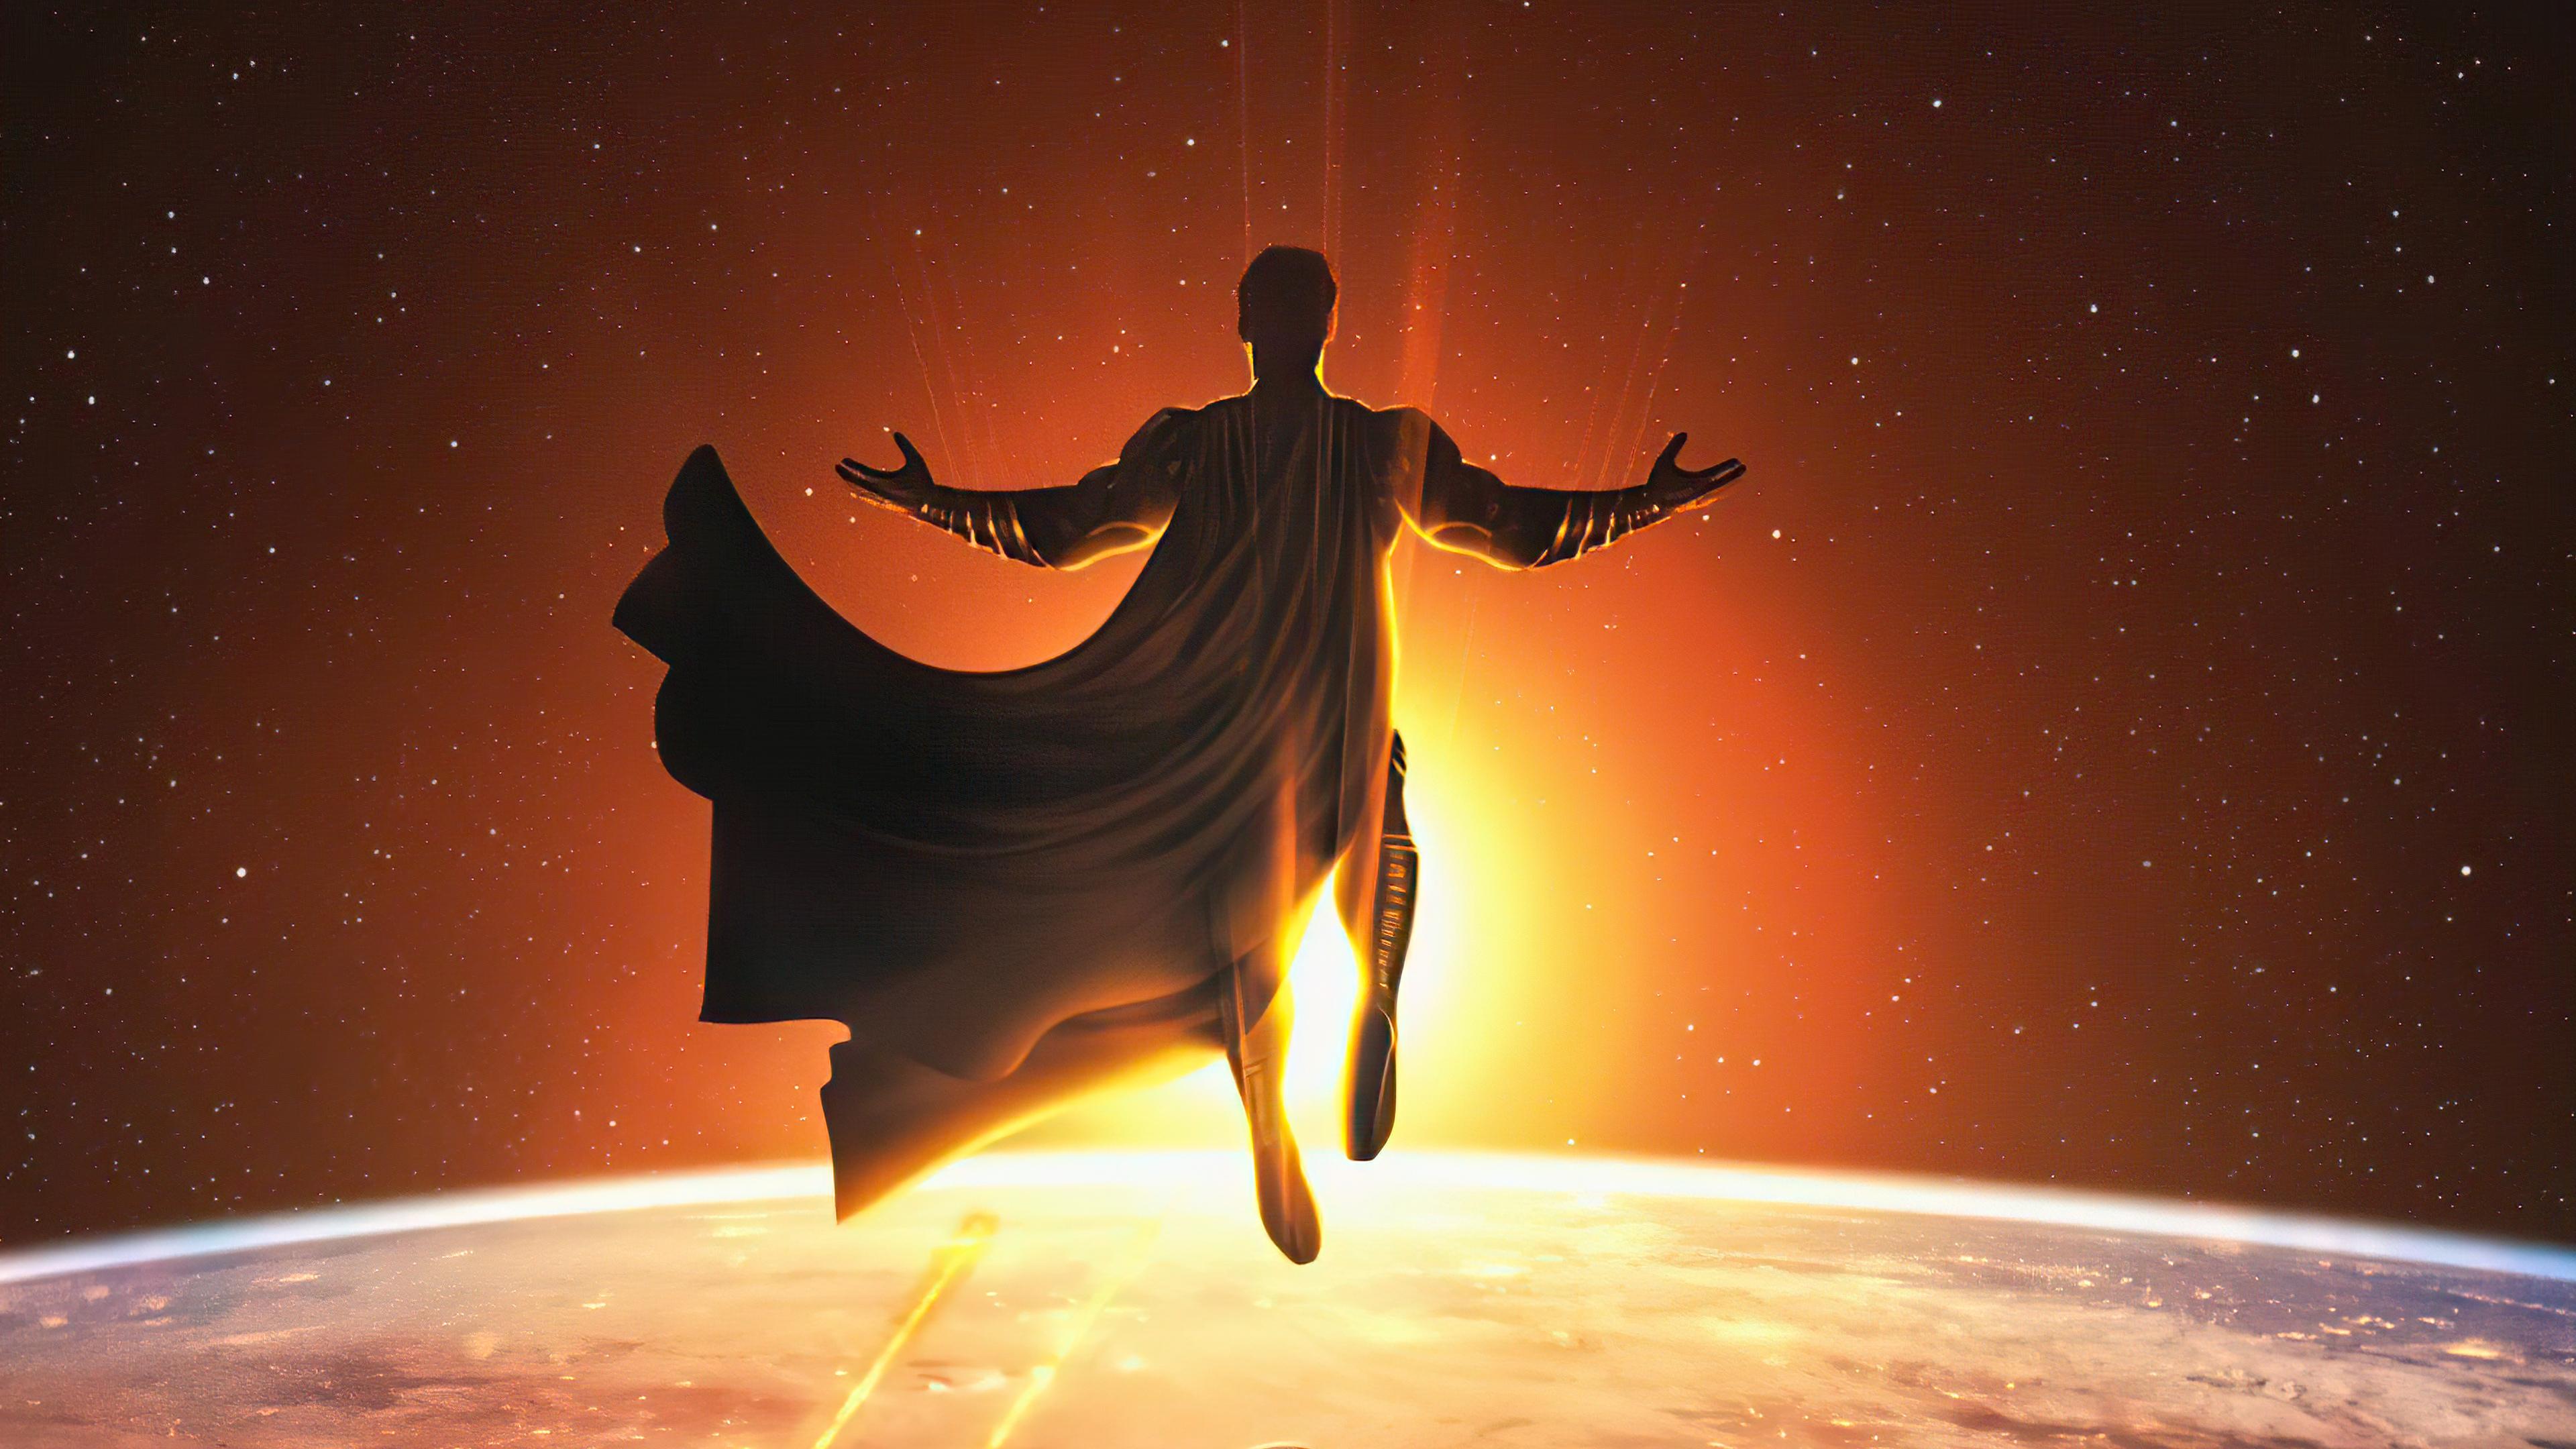 superman and dark sied 4k 1618165968 - Superman And Dark Sied 4k - Superman And Dark Sied 4k wallpapers